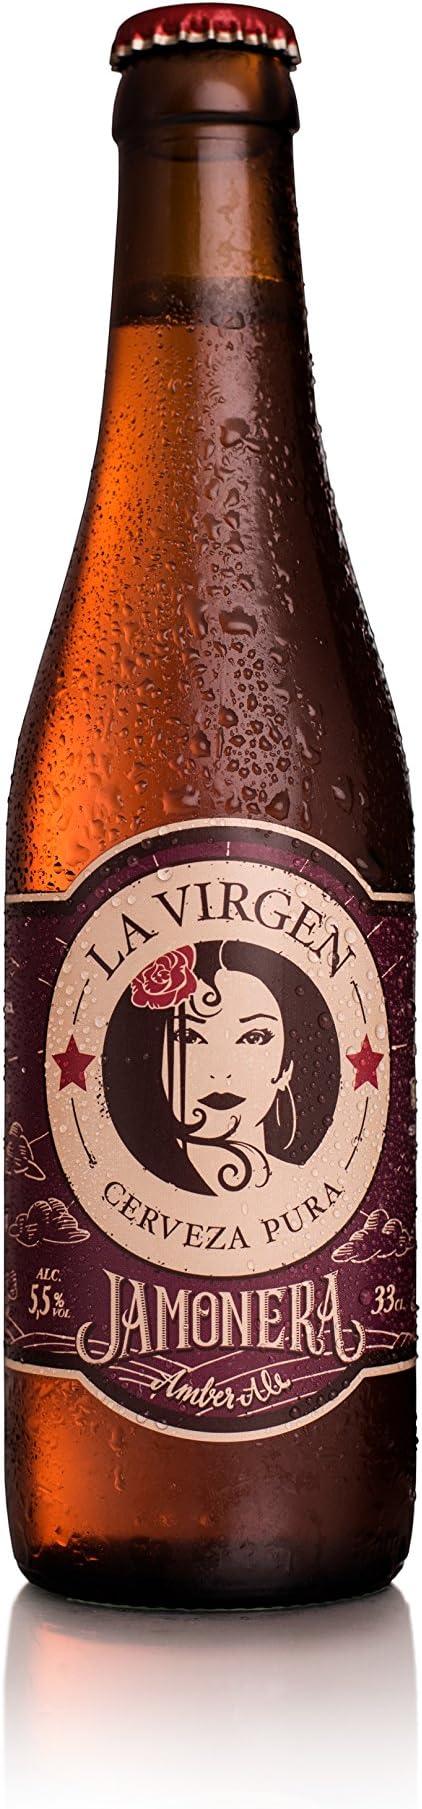 La Virgen Cerveza Artesana Jamonera - pack 24 botellas x 330 ml ...